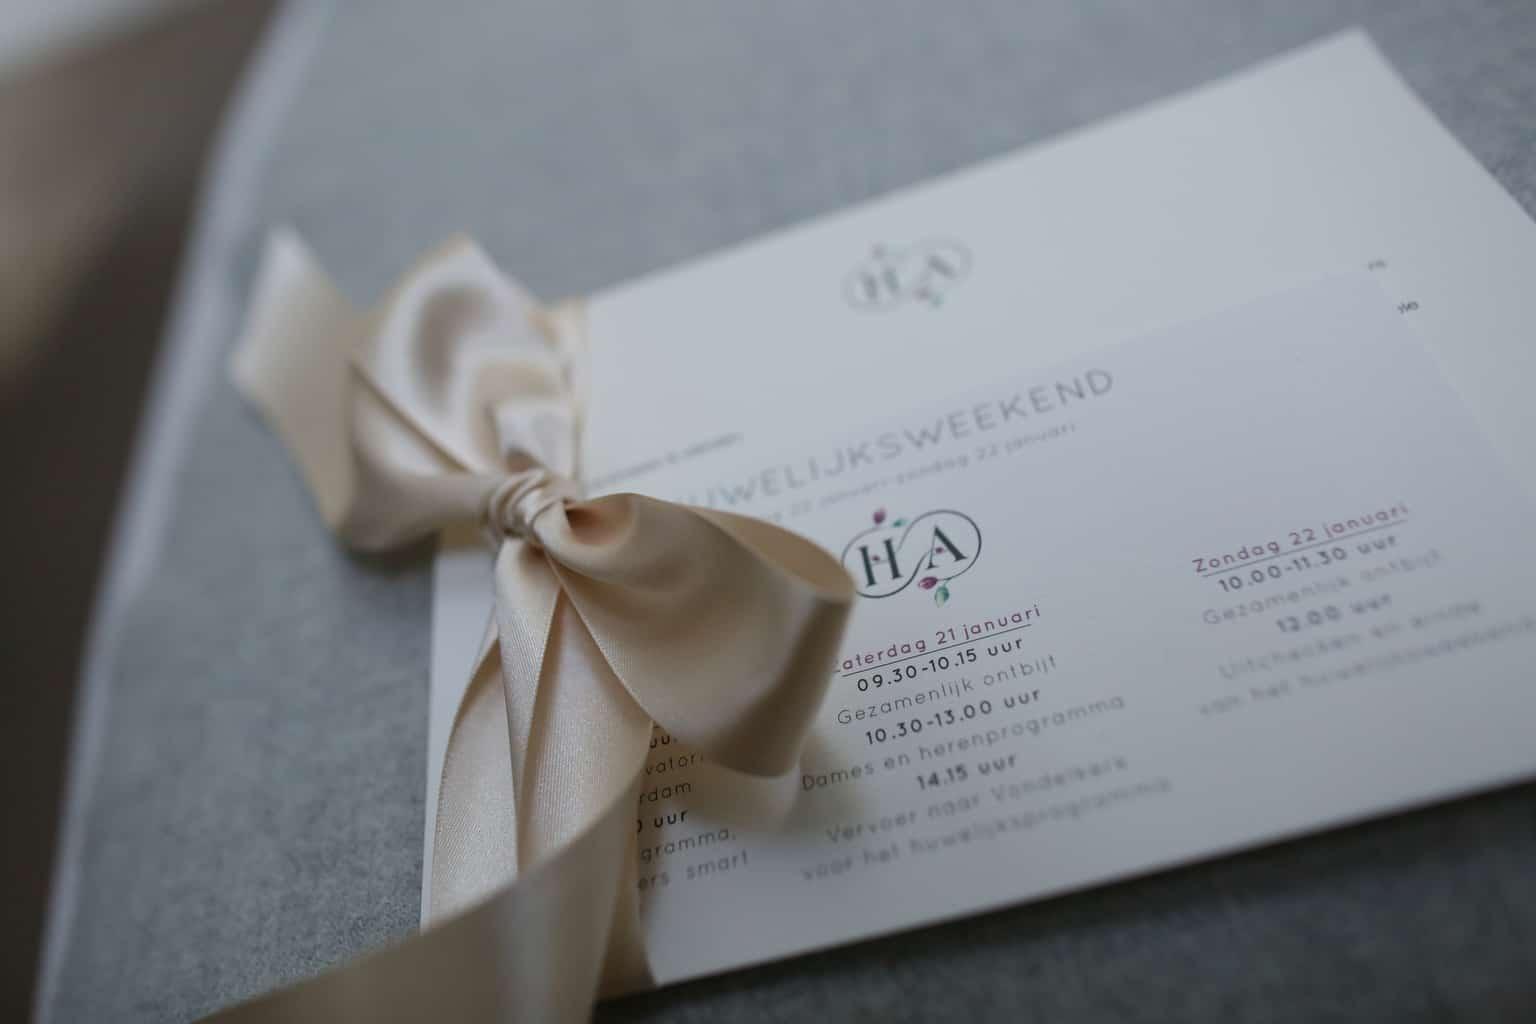 Wedding en Planning | weddingplanner | signing | welkom gasten stationery huwelijk | huwelijk in Conservatoriumhotel Amsterdam | winterwedding fotocredits Karen Kaper.jpg